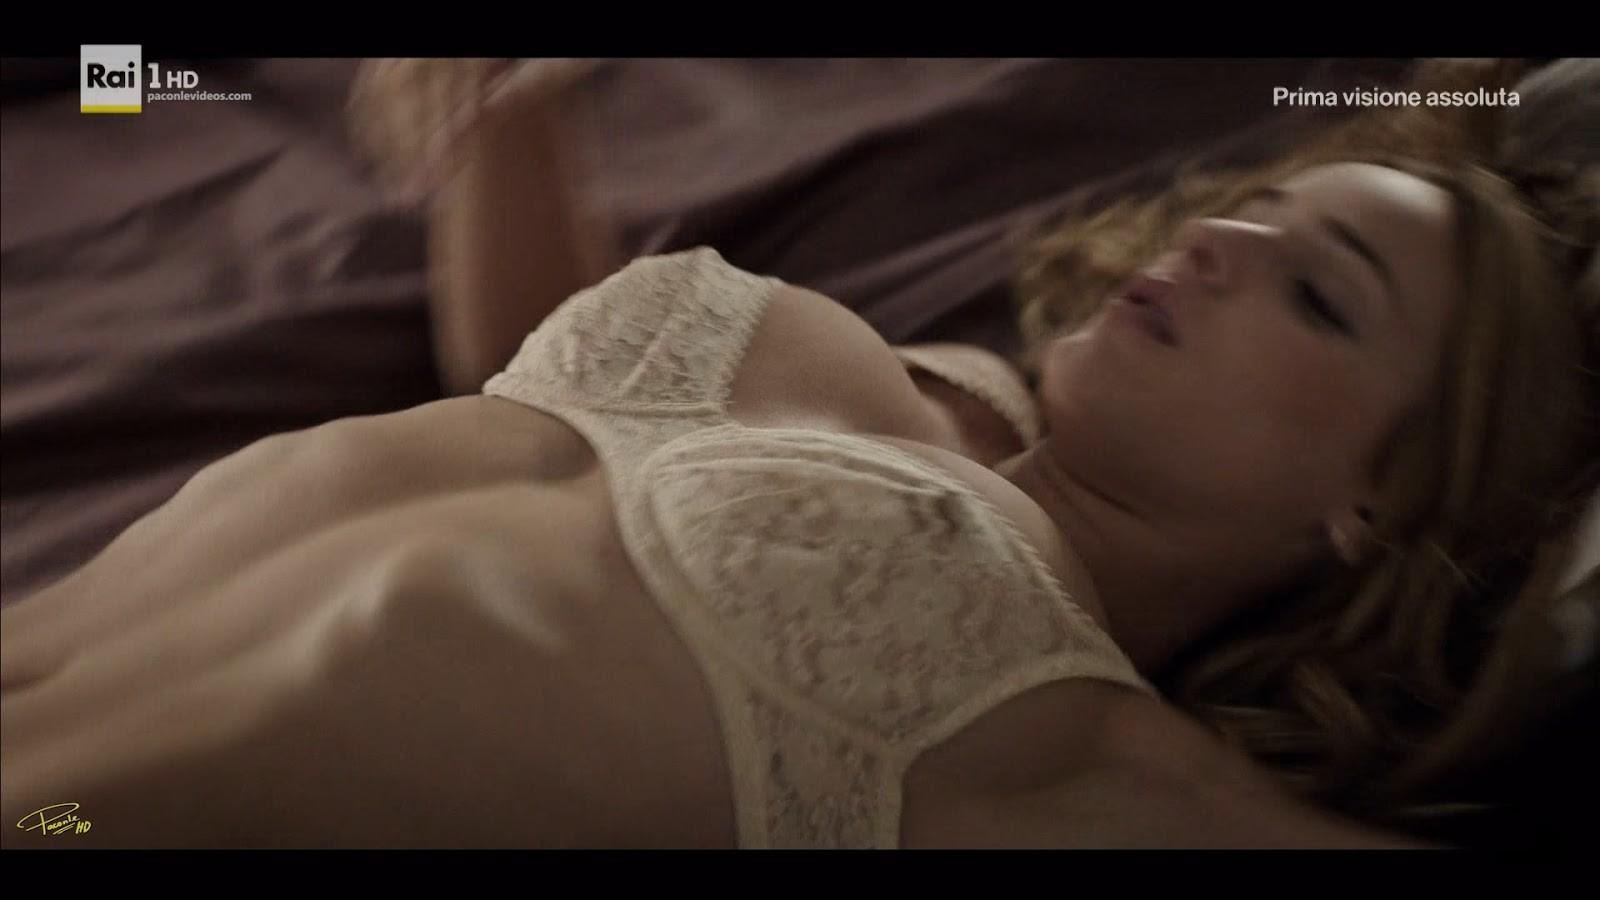 Alejandra Onieva Desnuda Página 2 Fotos Desnuda Descuido Topless